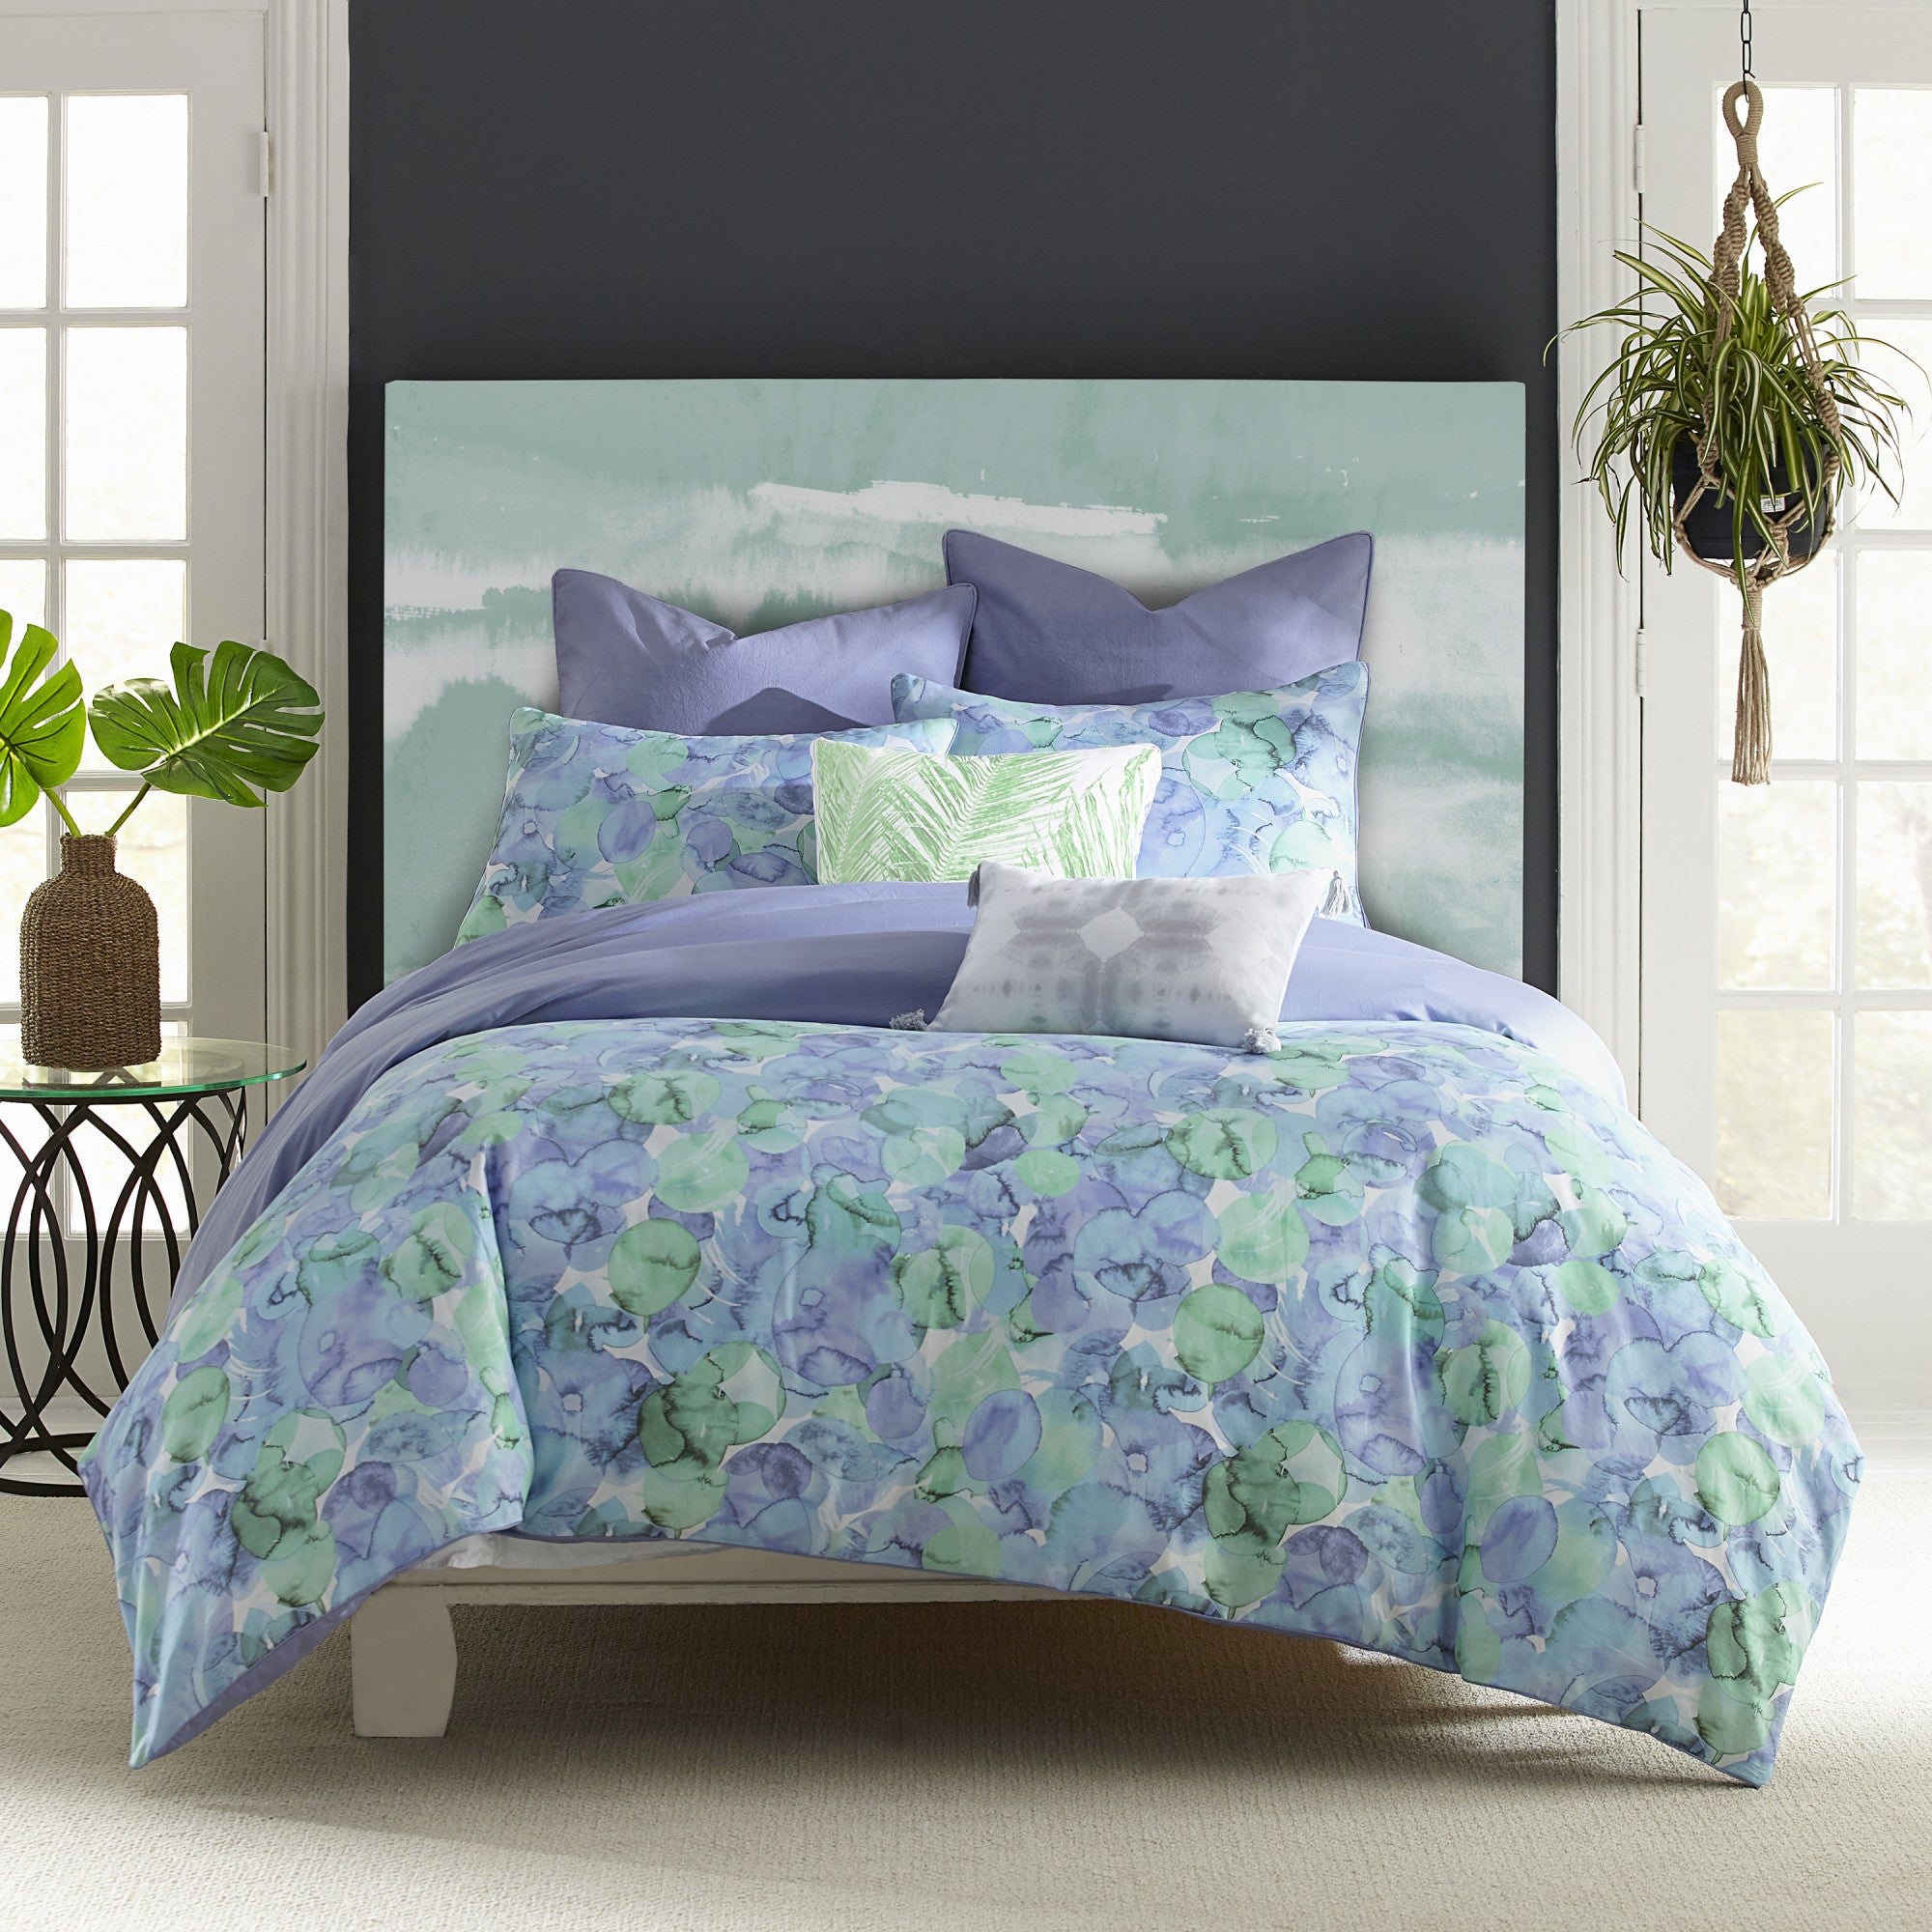 covina cotton comforter overstock product essentials bed sheet bath com complete madison set aqua and park bedding